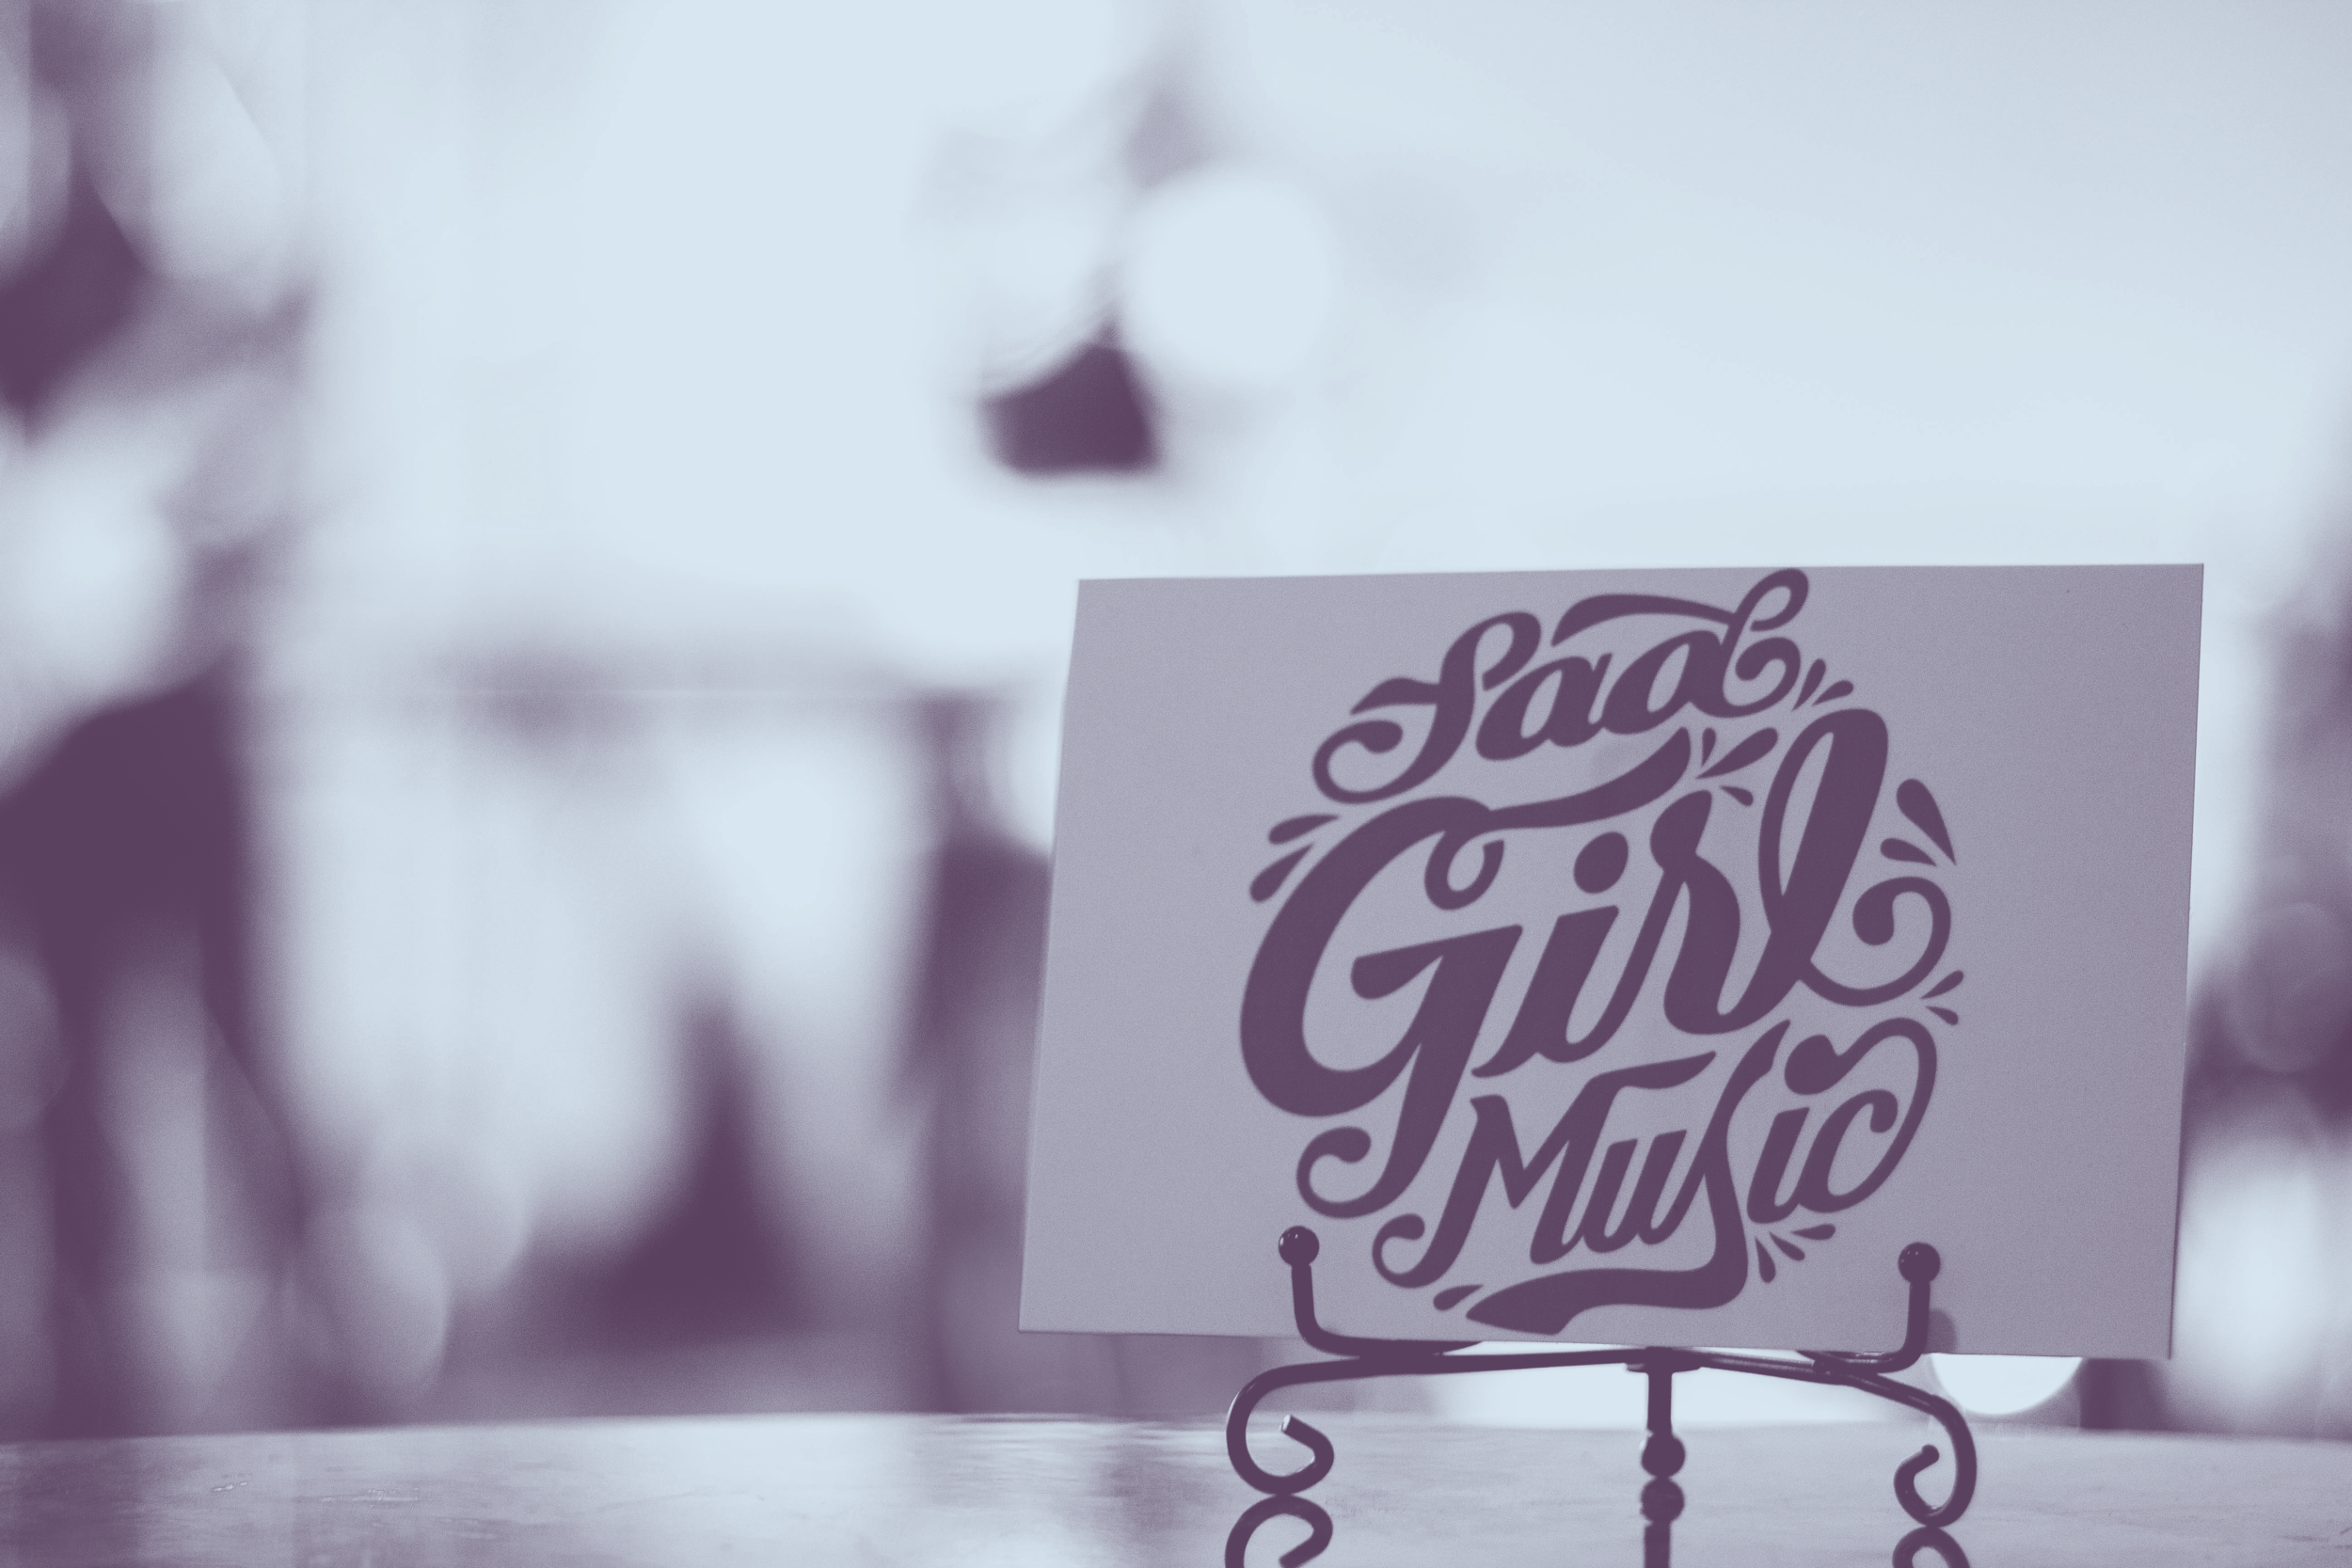 Sad Girl Night One Year Anniversary - H.O.M.E. | Sept. 22nd